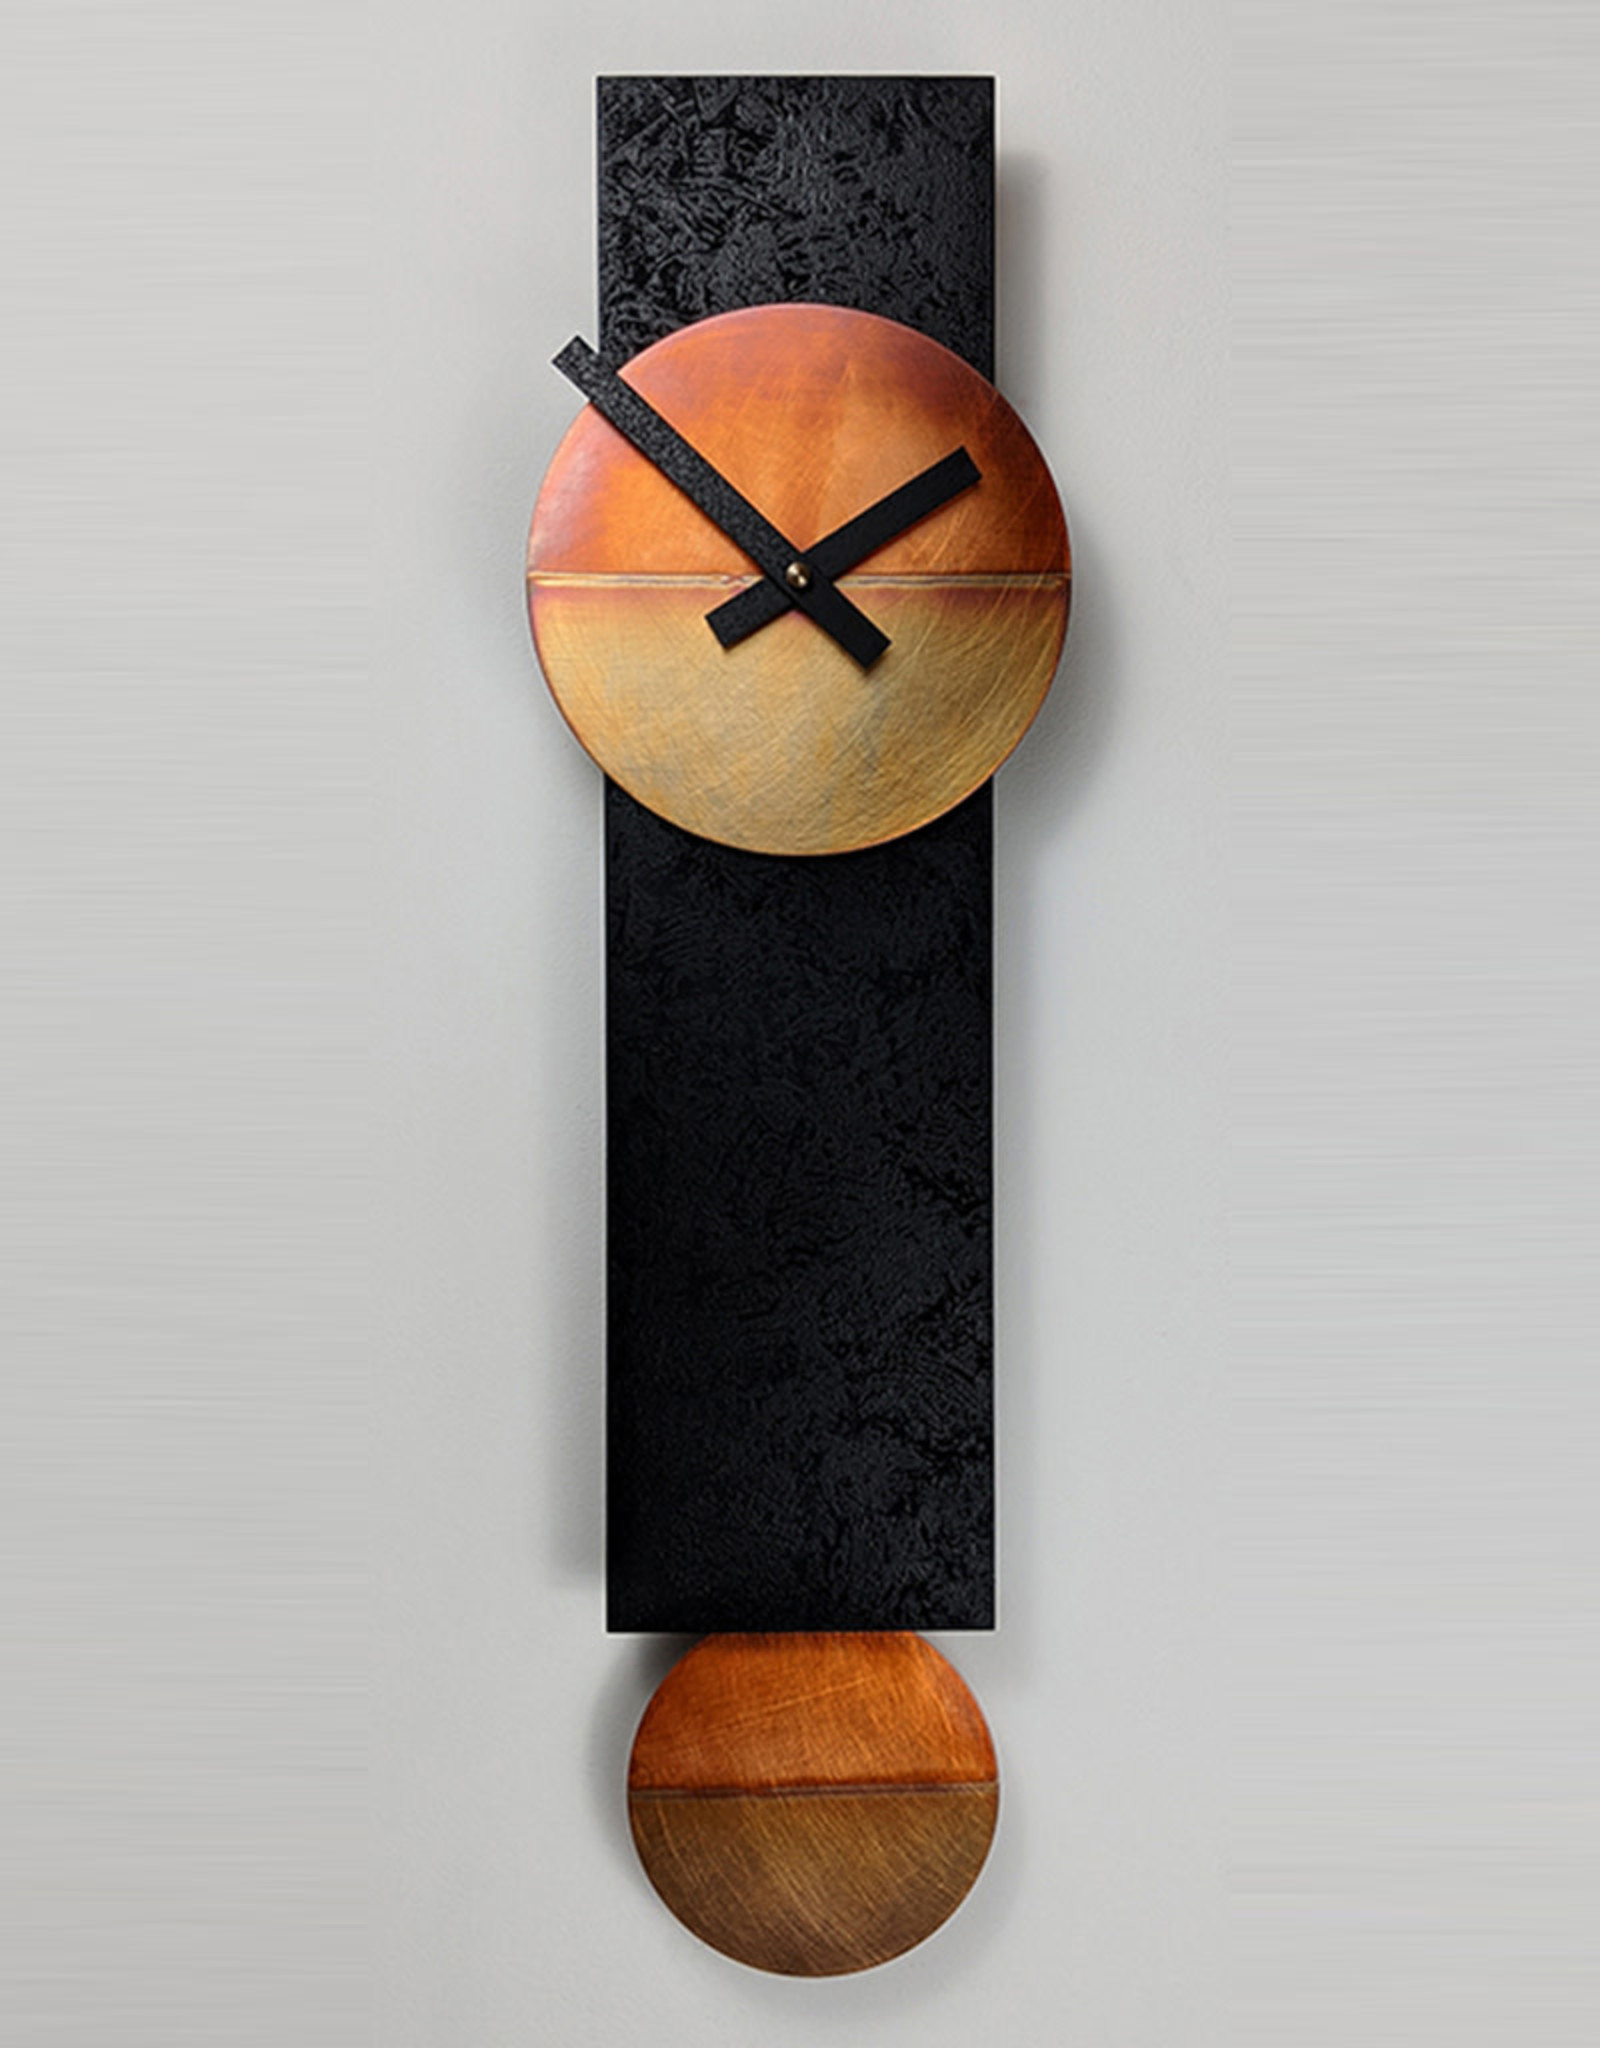 LEONIE LACOUETTE NARROW BLACK & COPPER PENDULUM CLOCK